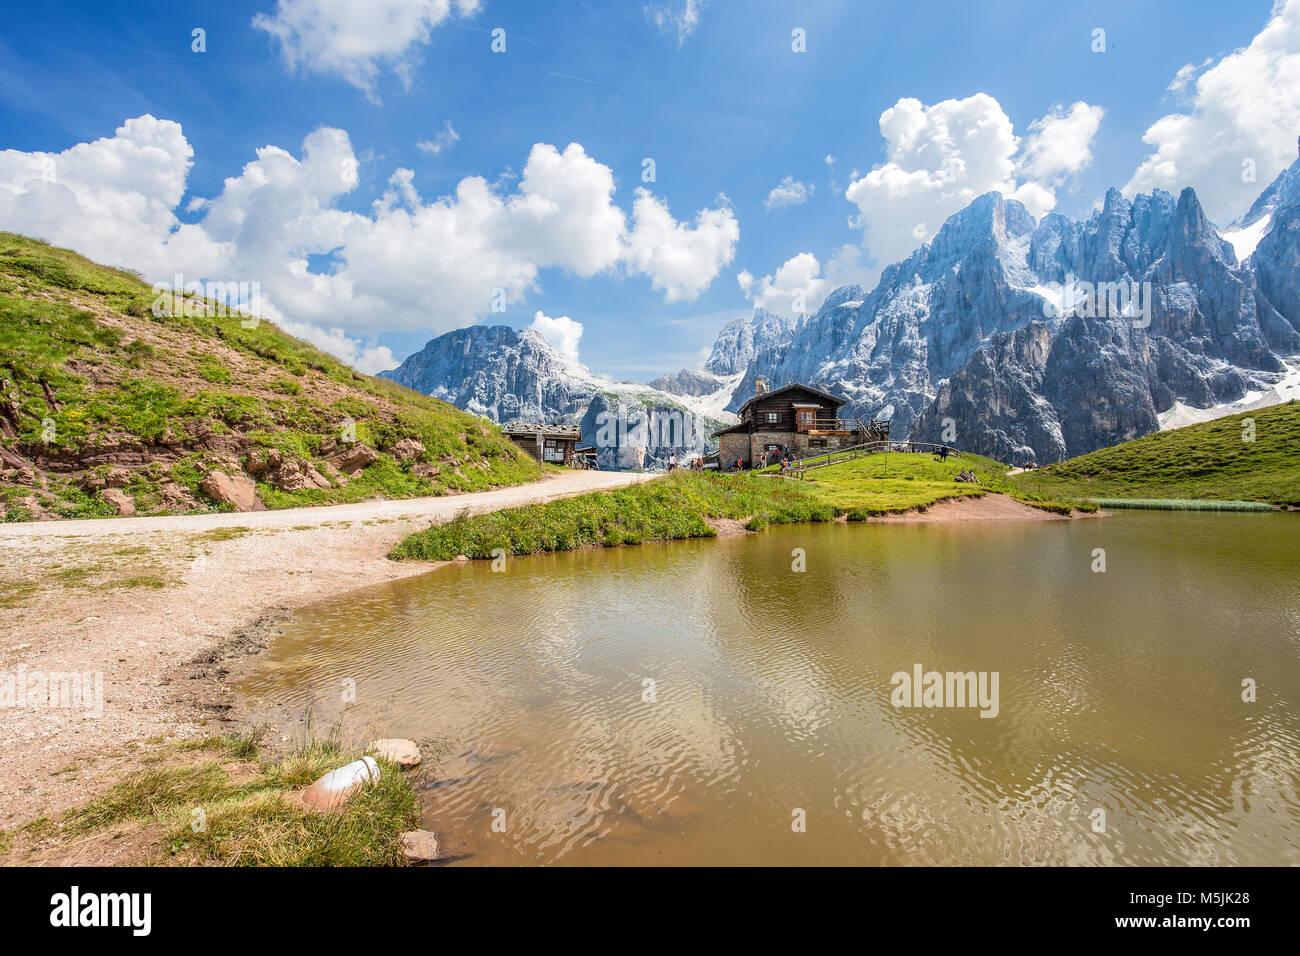 Dolomites Alps in Italy, Pale di San Martino mountains and Baita Segantini with the lake / landscape Stock Photo